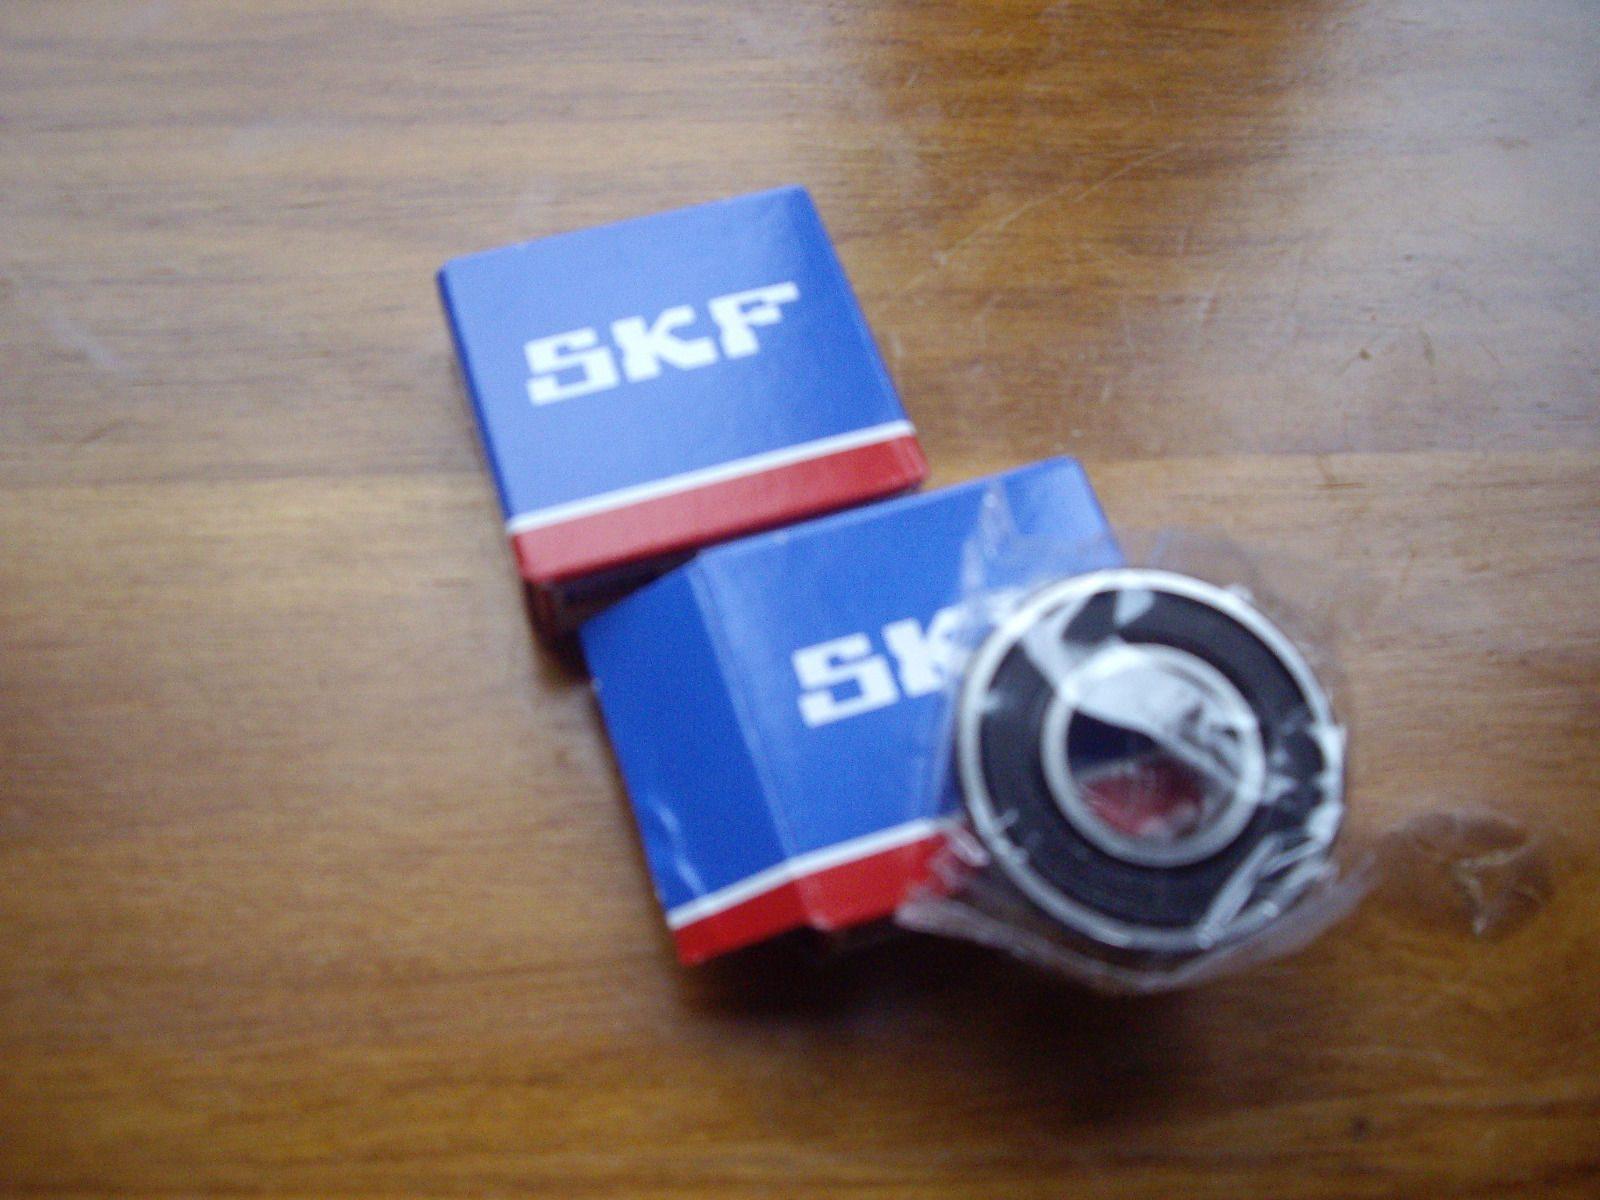 Royal Enfield Bullet (Indian) Rear Wheel Bearings Manufacturer S.K.F.